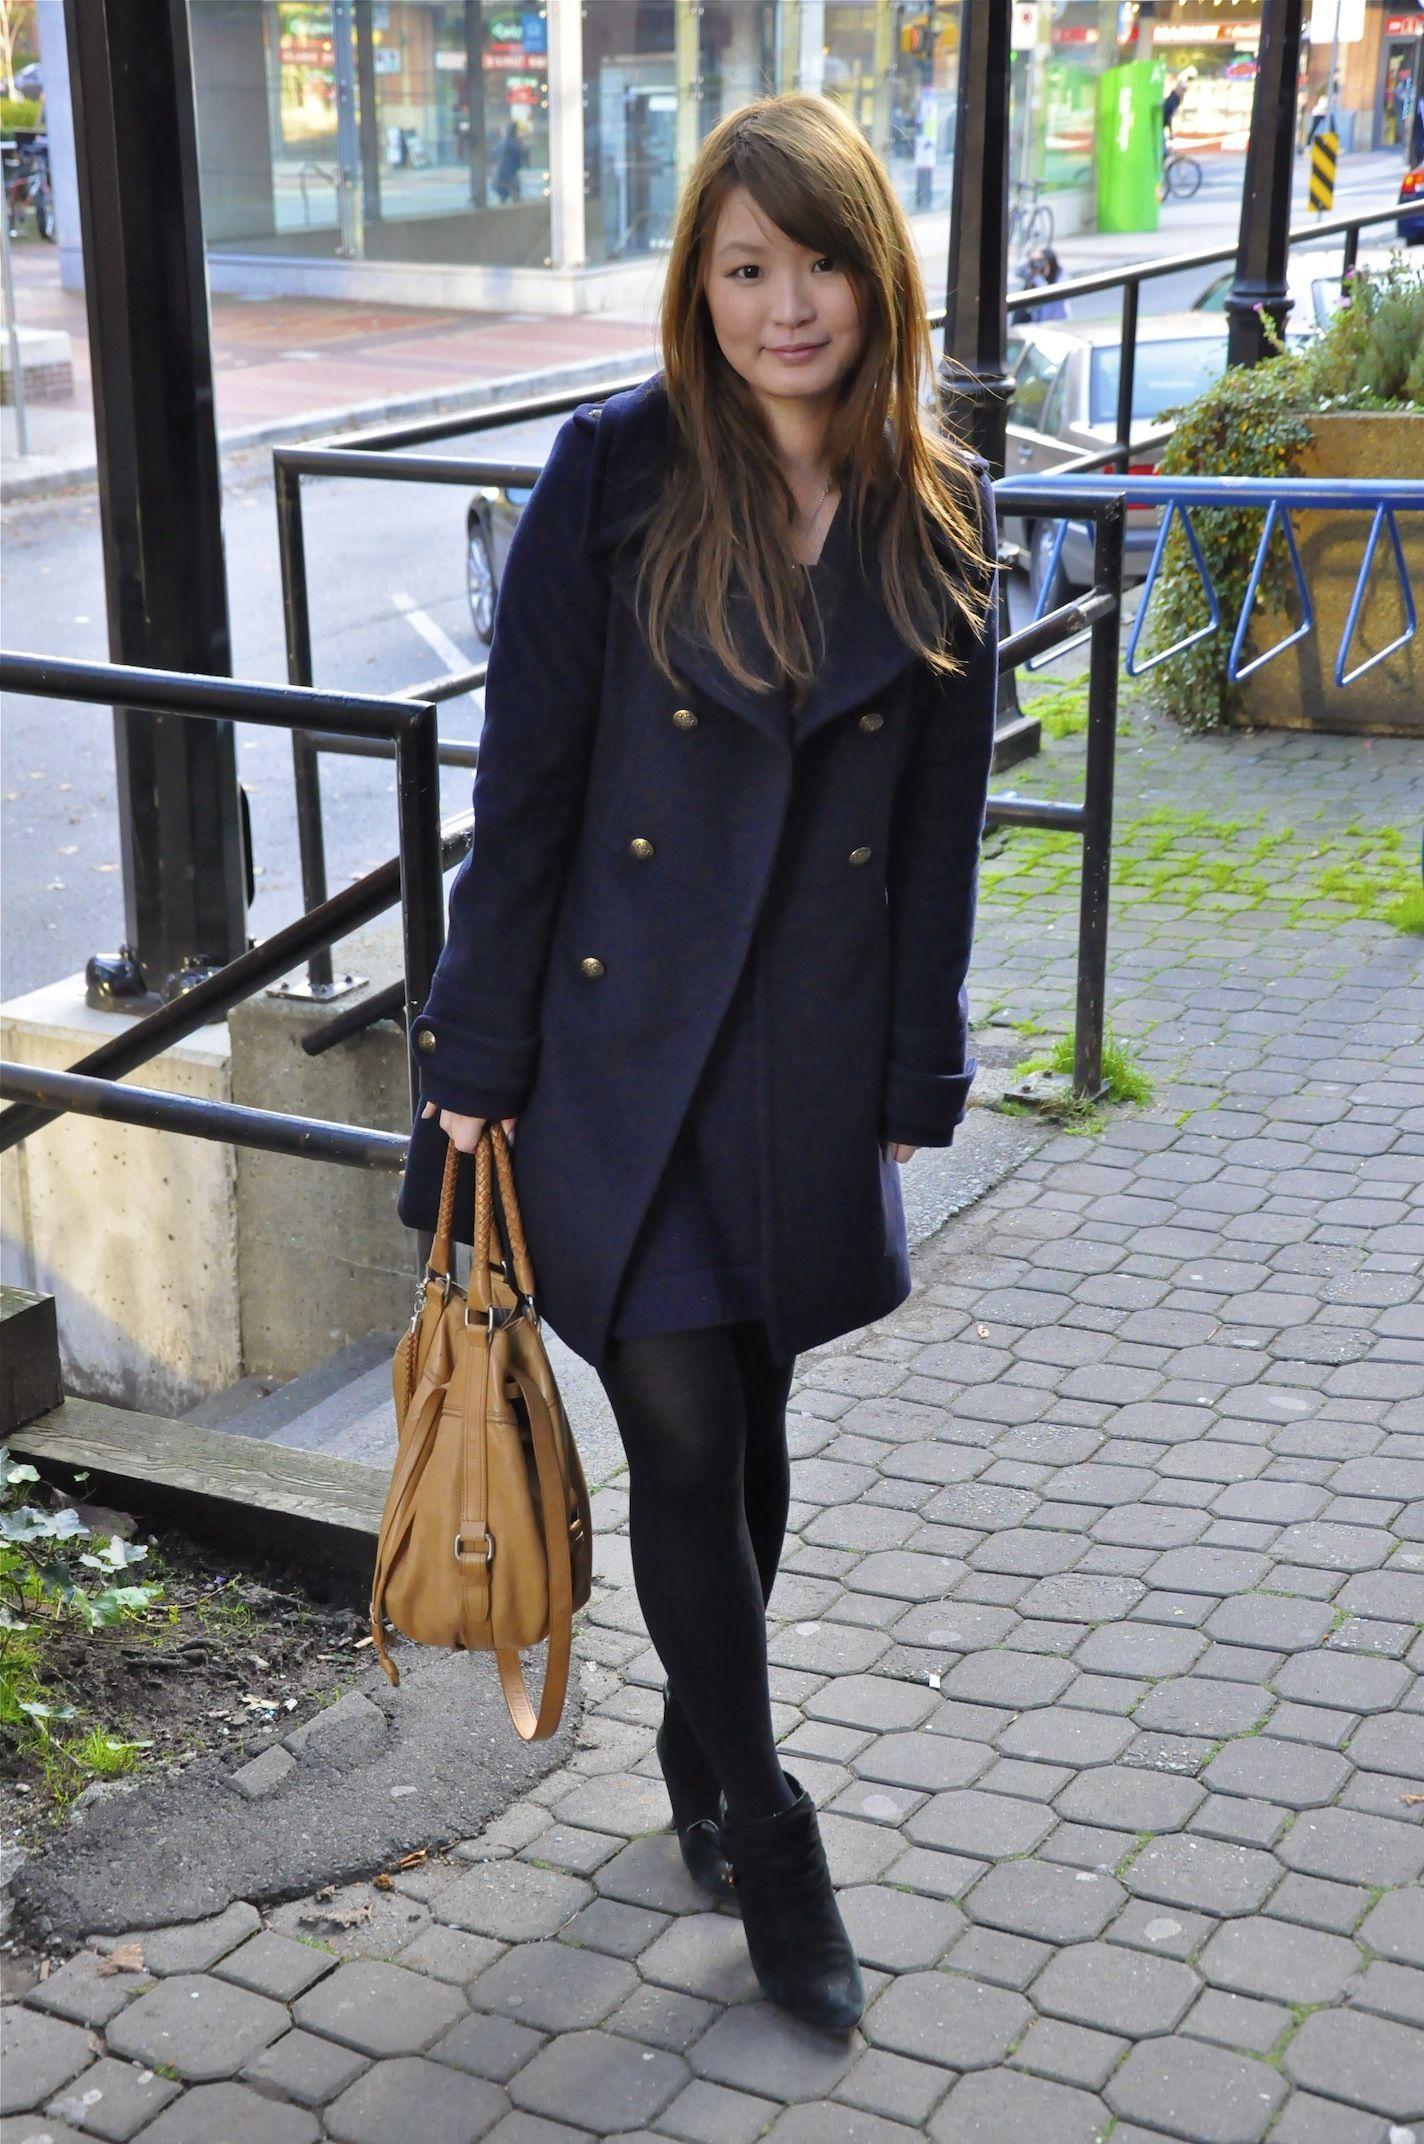 acheter la tenue sur lookastic: https://lookastic.fr/mode-femme